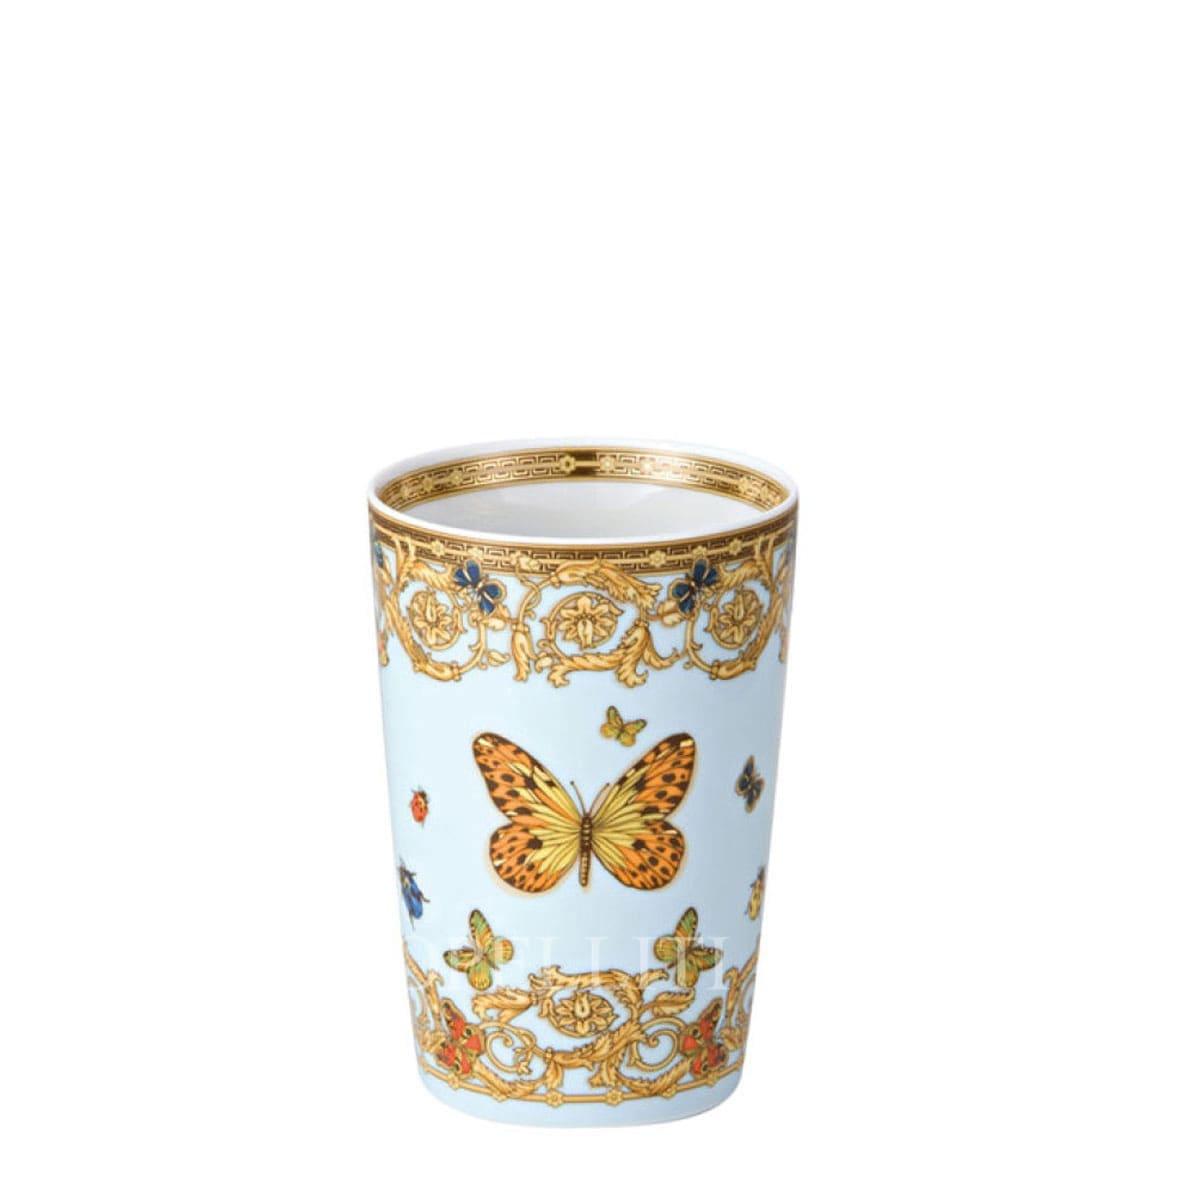 versace italian design mug without handles le jardin de versace